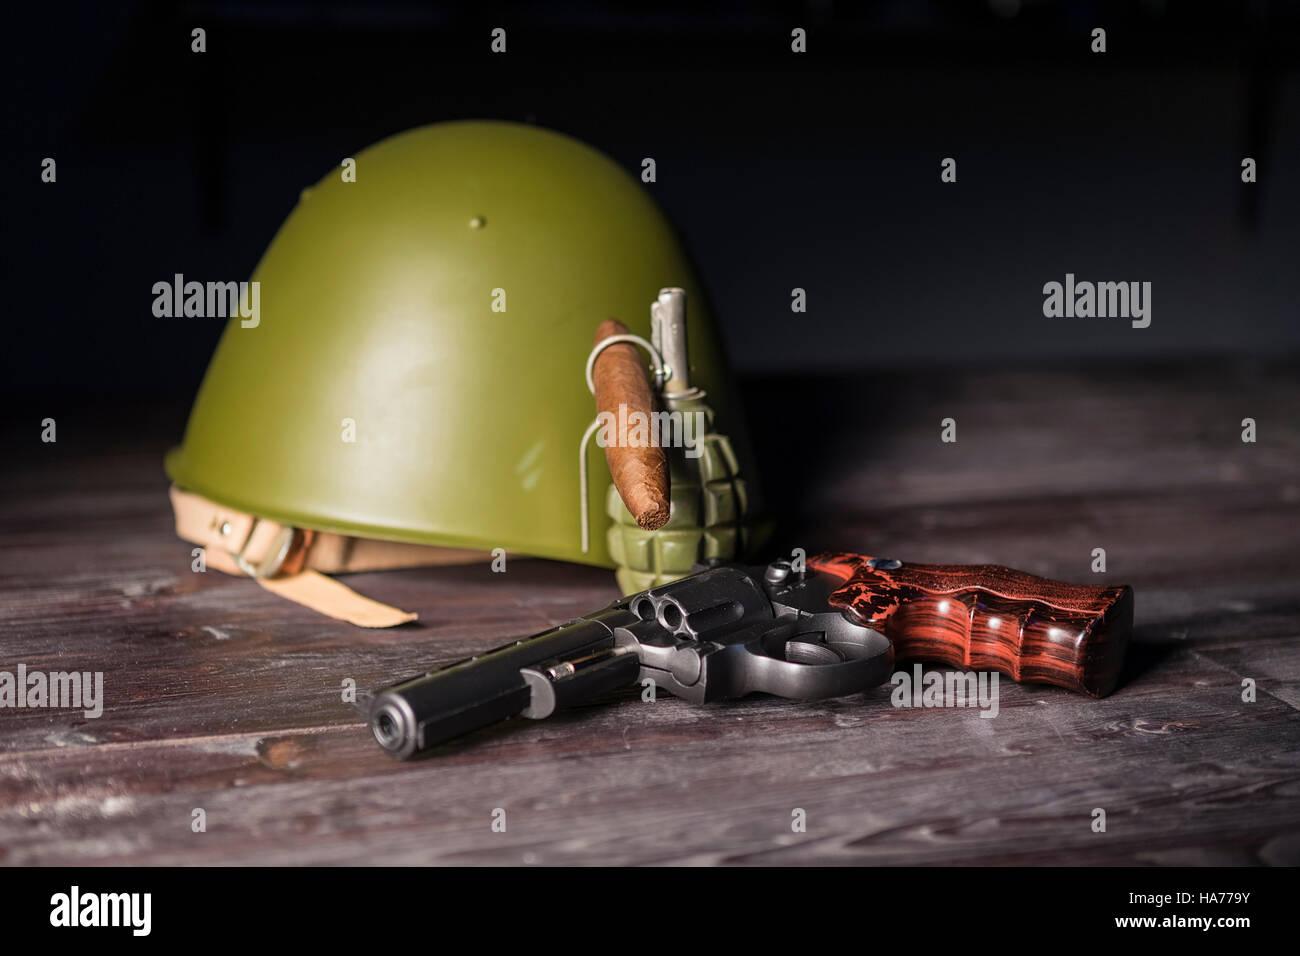 Gun revolver, grenade, protective helmet on the table. - Stock Image